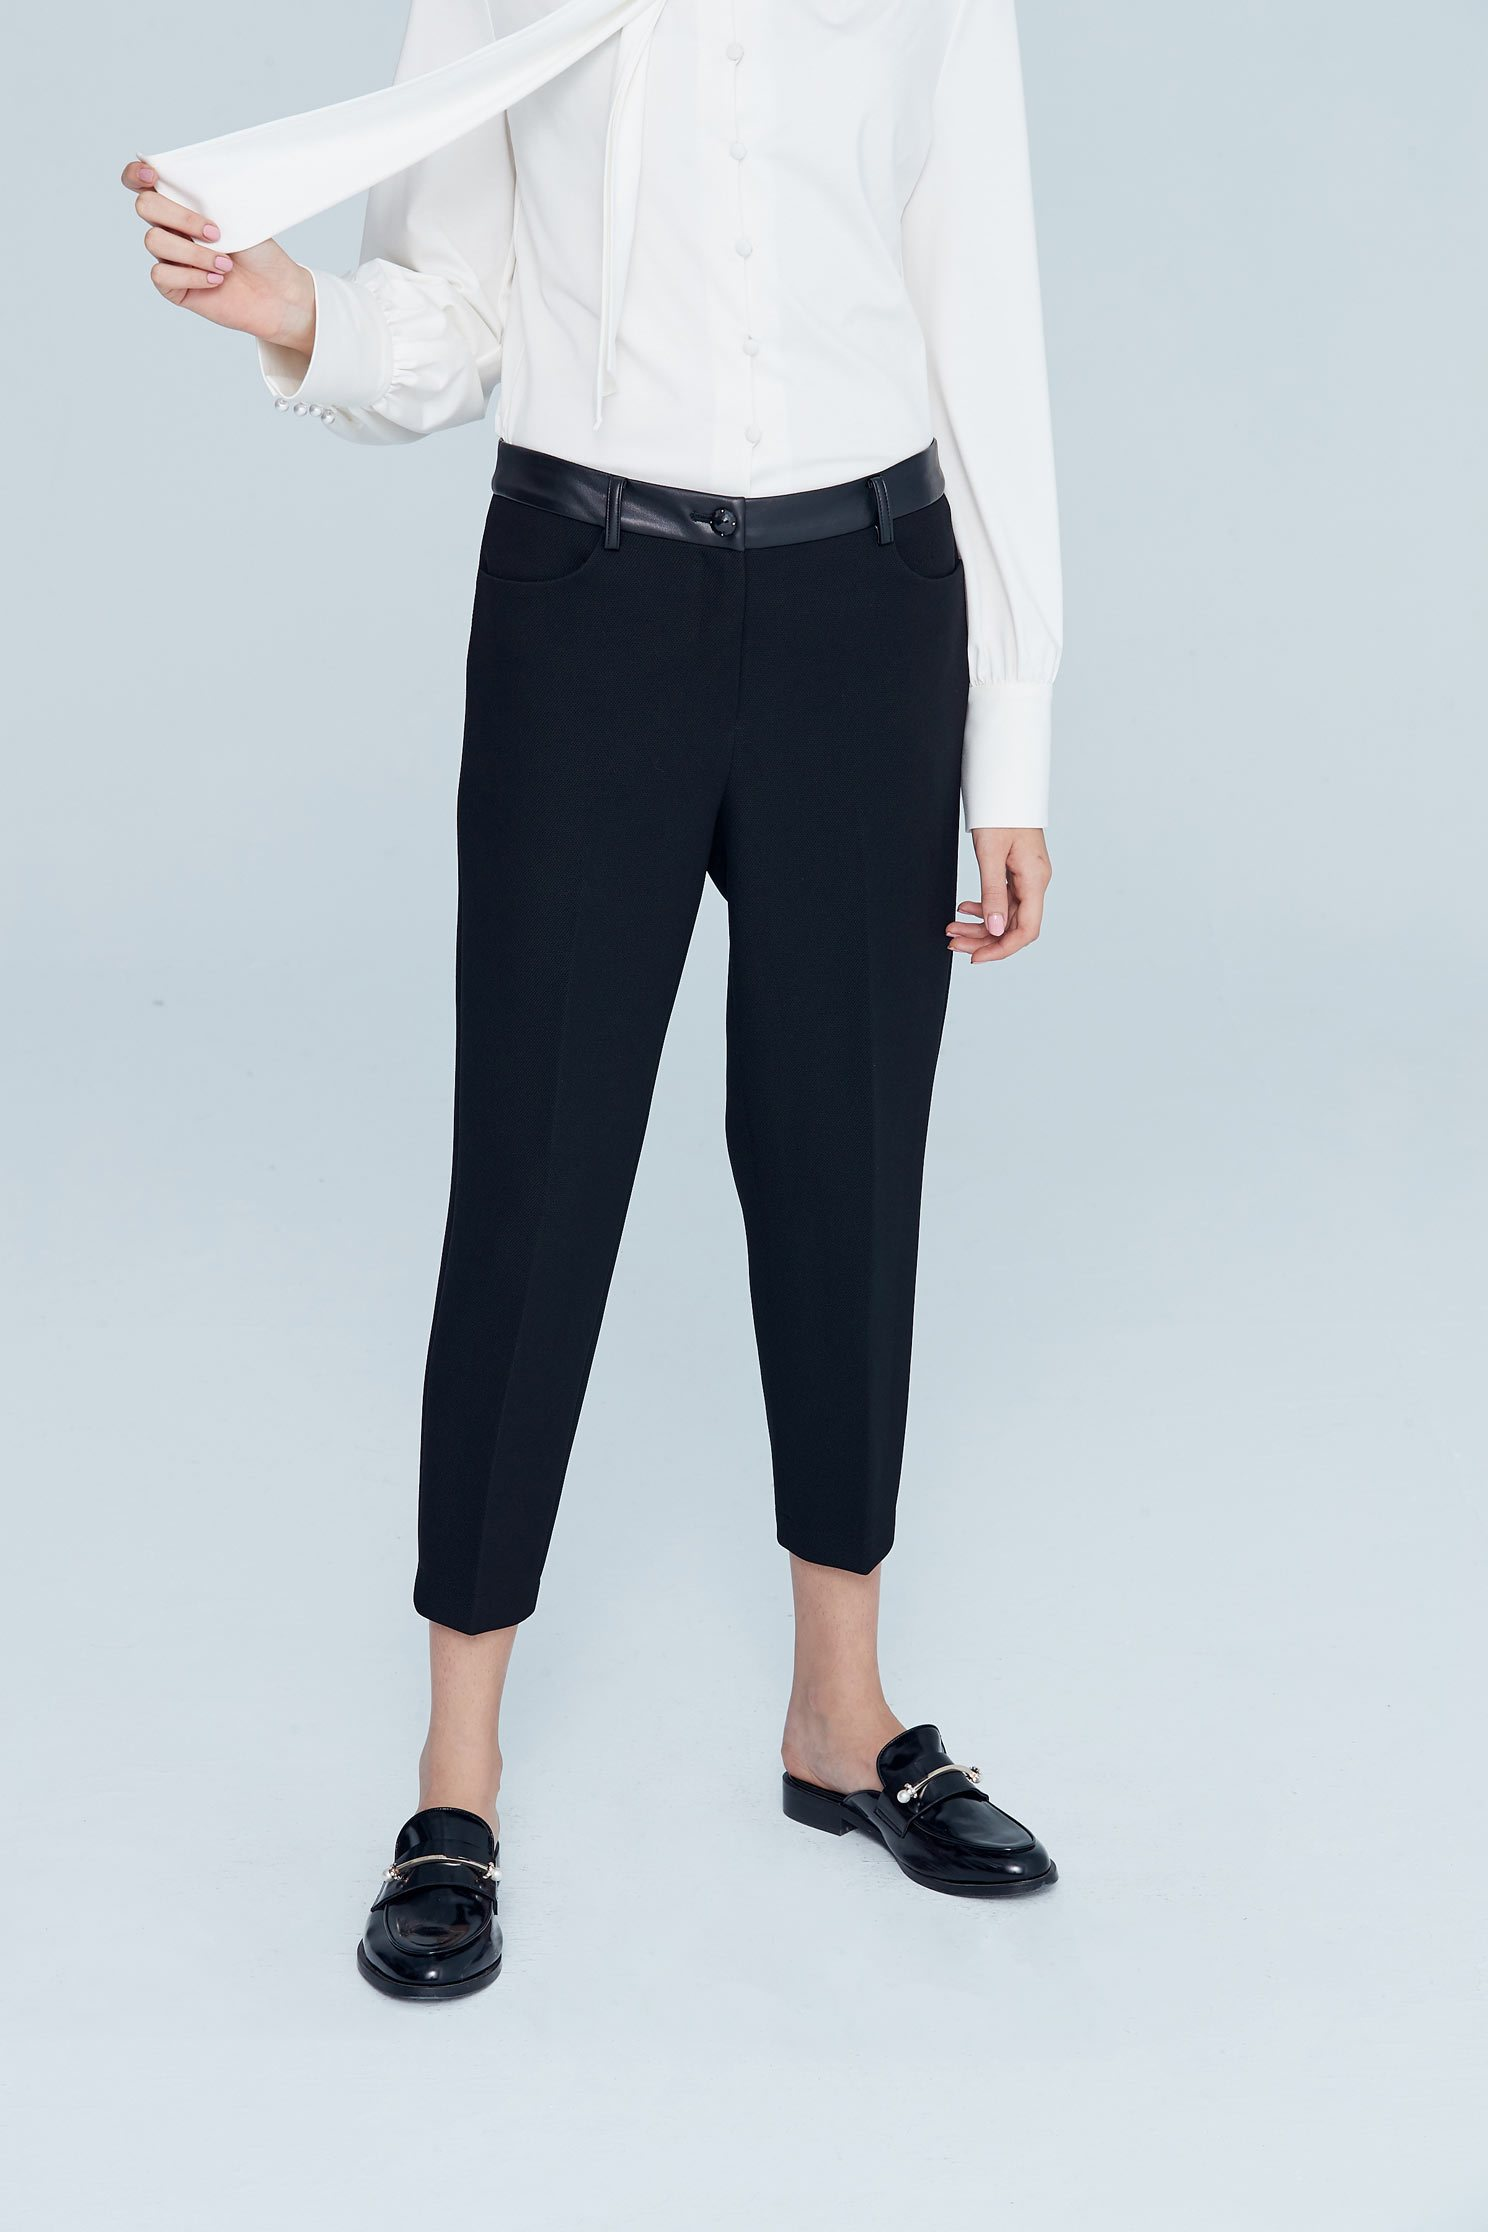 Slim classic pants,skinnypants,pants,pants,thinpants,blacktrousers